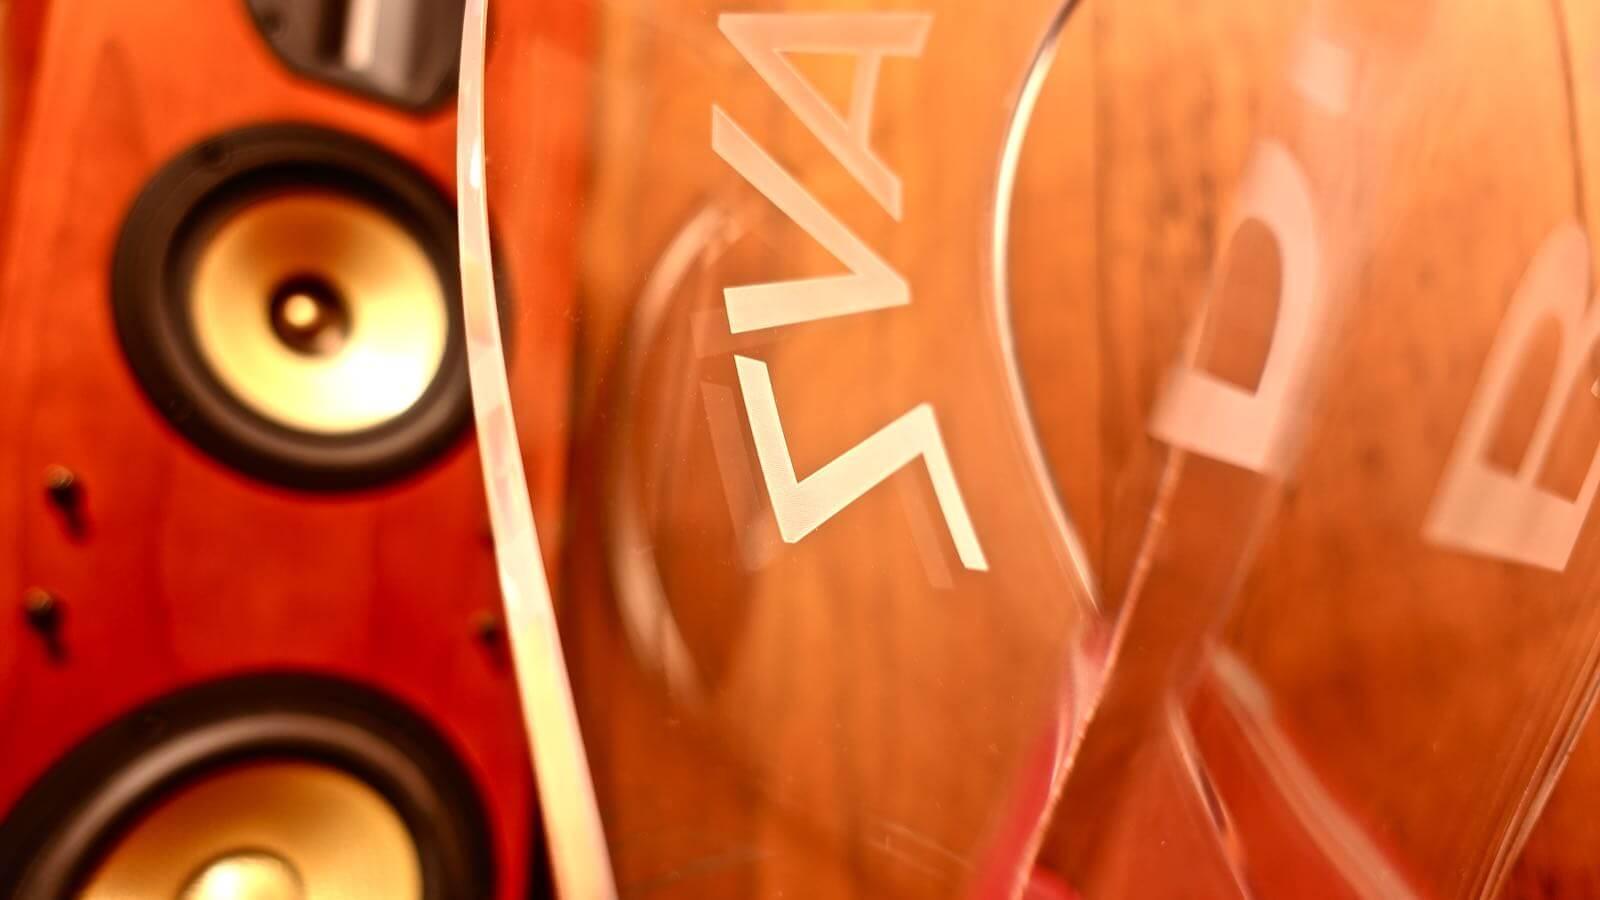 0080 OMEGA type headphone stand BRAINWAVZ review 05